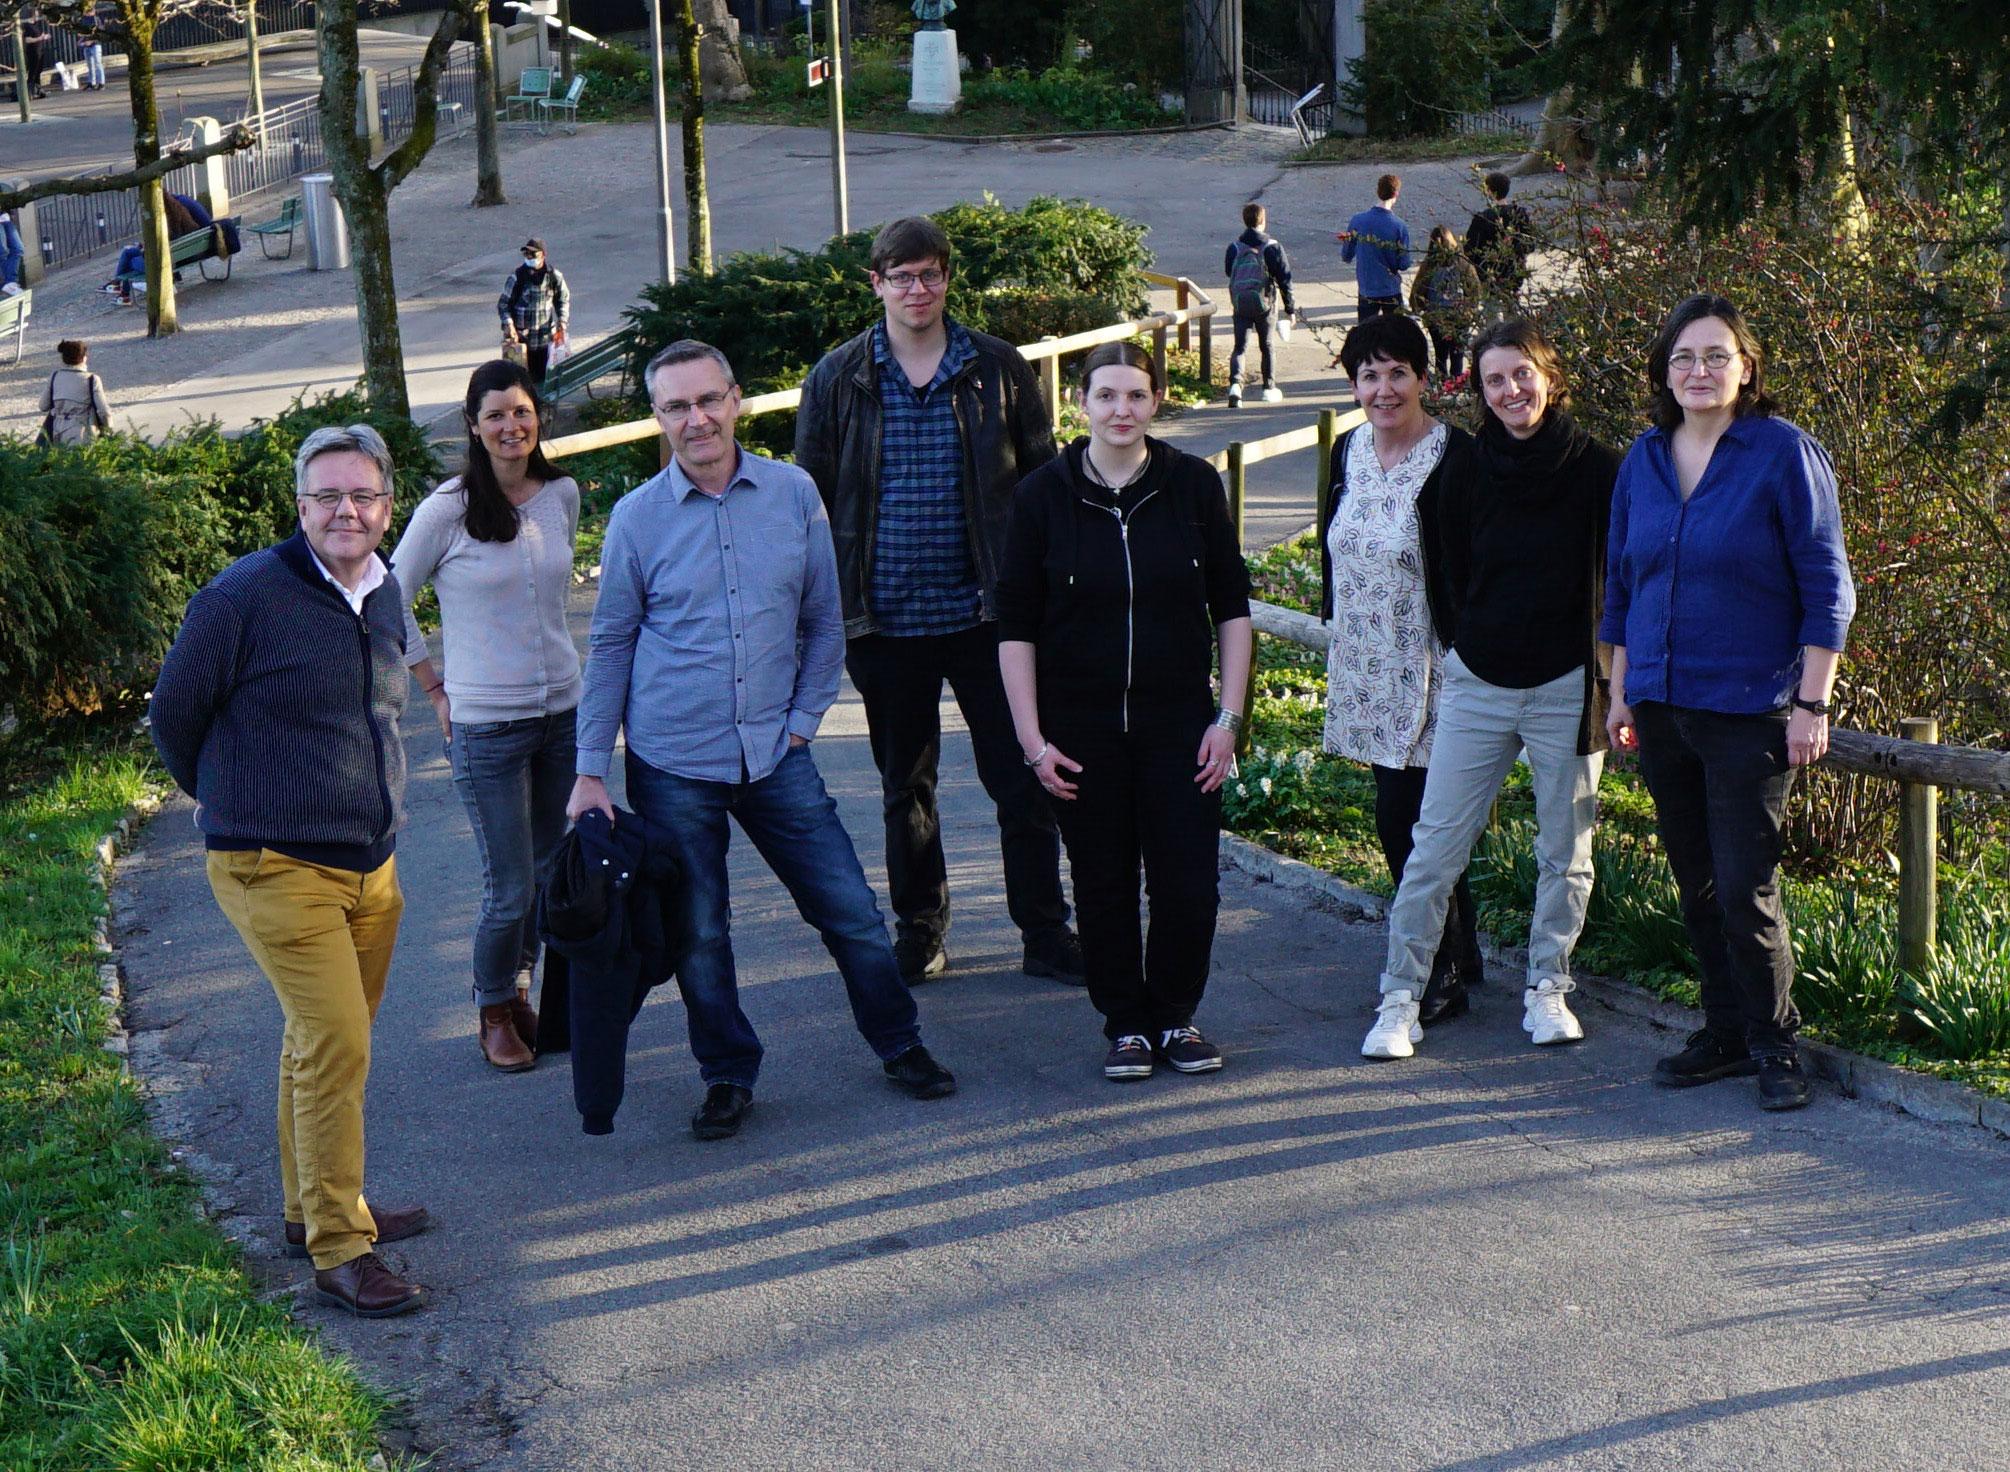 Photo de l'équipe ITMS, Berne (mars 2021). De gauche à droite: Lorenzo Fedel, Fanny Puthod, Michael Nick, Jonas von Felten, Margareth Warburton, Anne-Francine Auberson, Sonya Luyet, Rahel C. Ackermann. Image: © 2021 ITMS